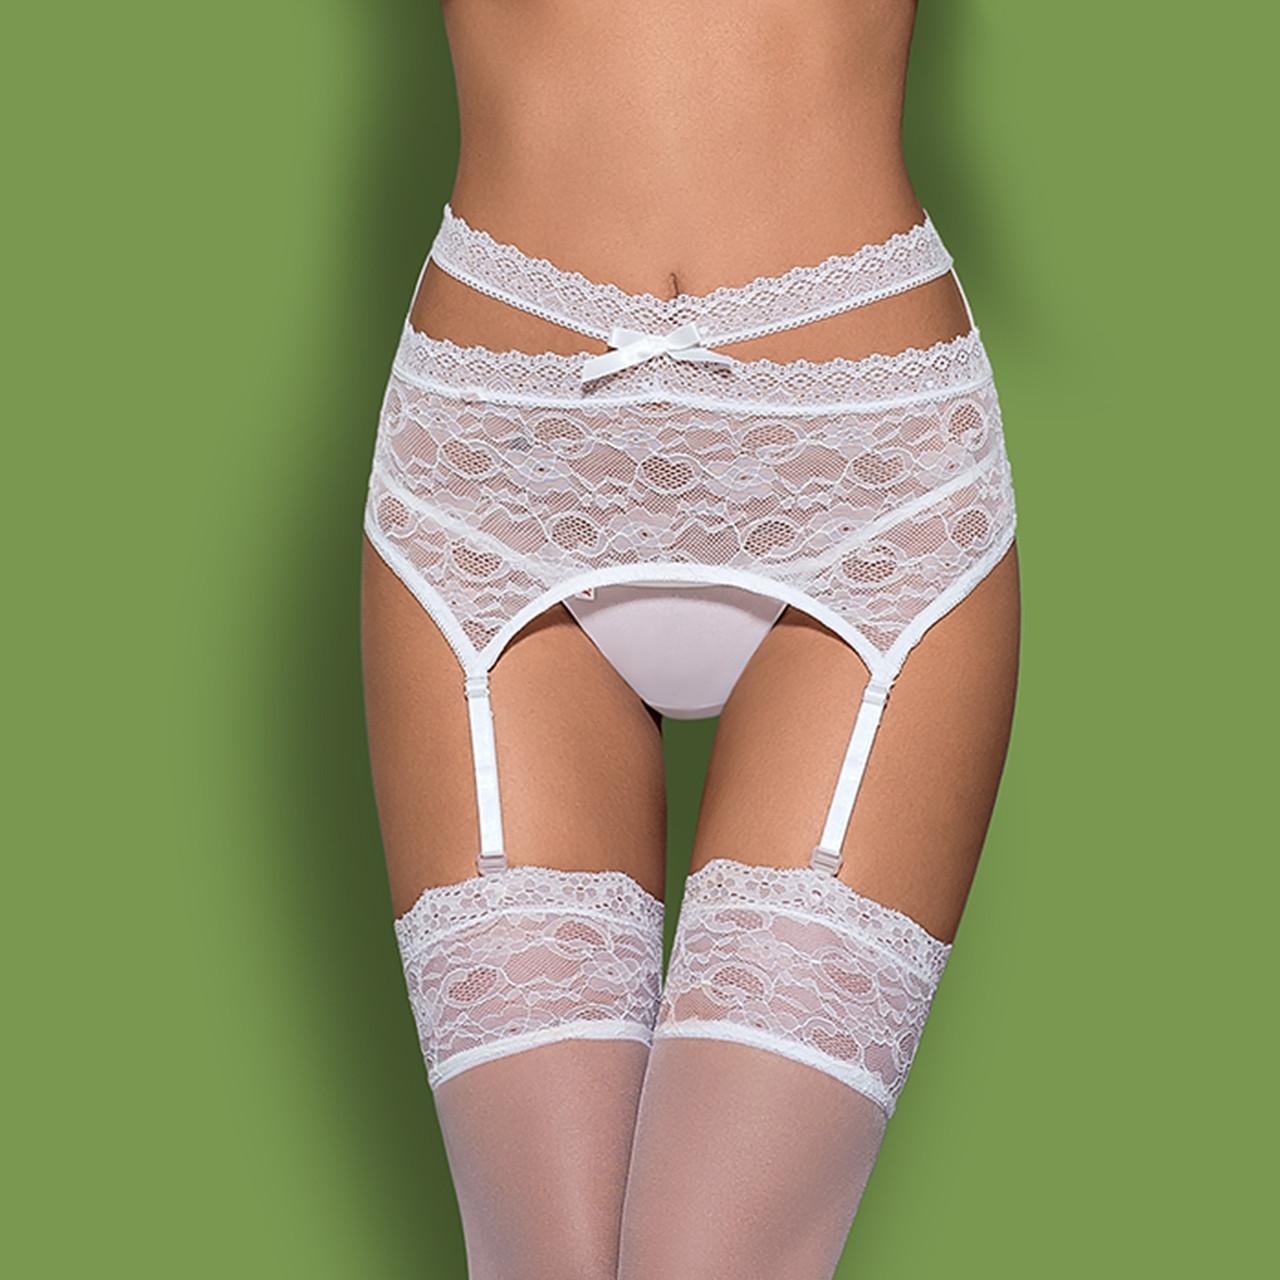 Белый кружевной пояс Obsessive Swanita garter belt white